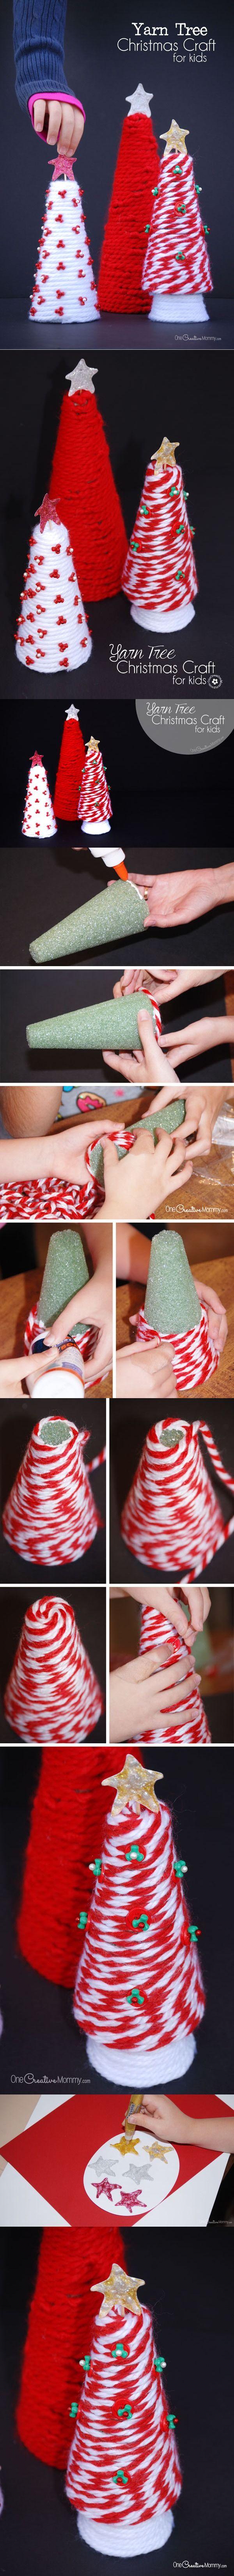 Manualidades navideñas para niños: Hermosos arbolitos de hilo - Muy Ingenioso